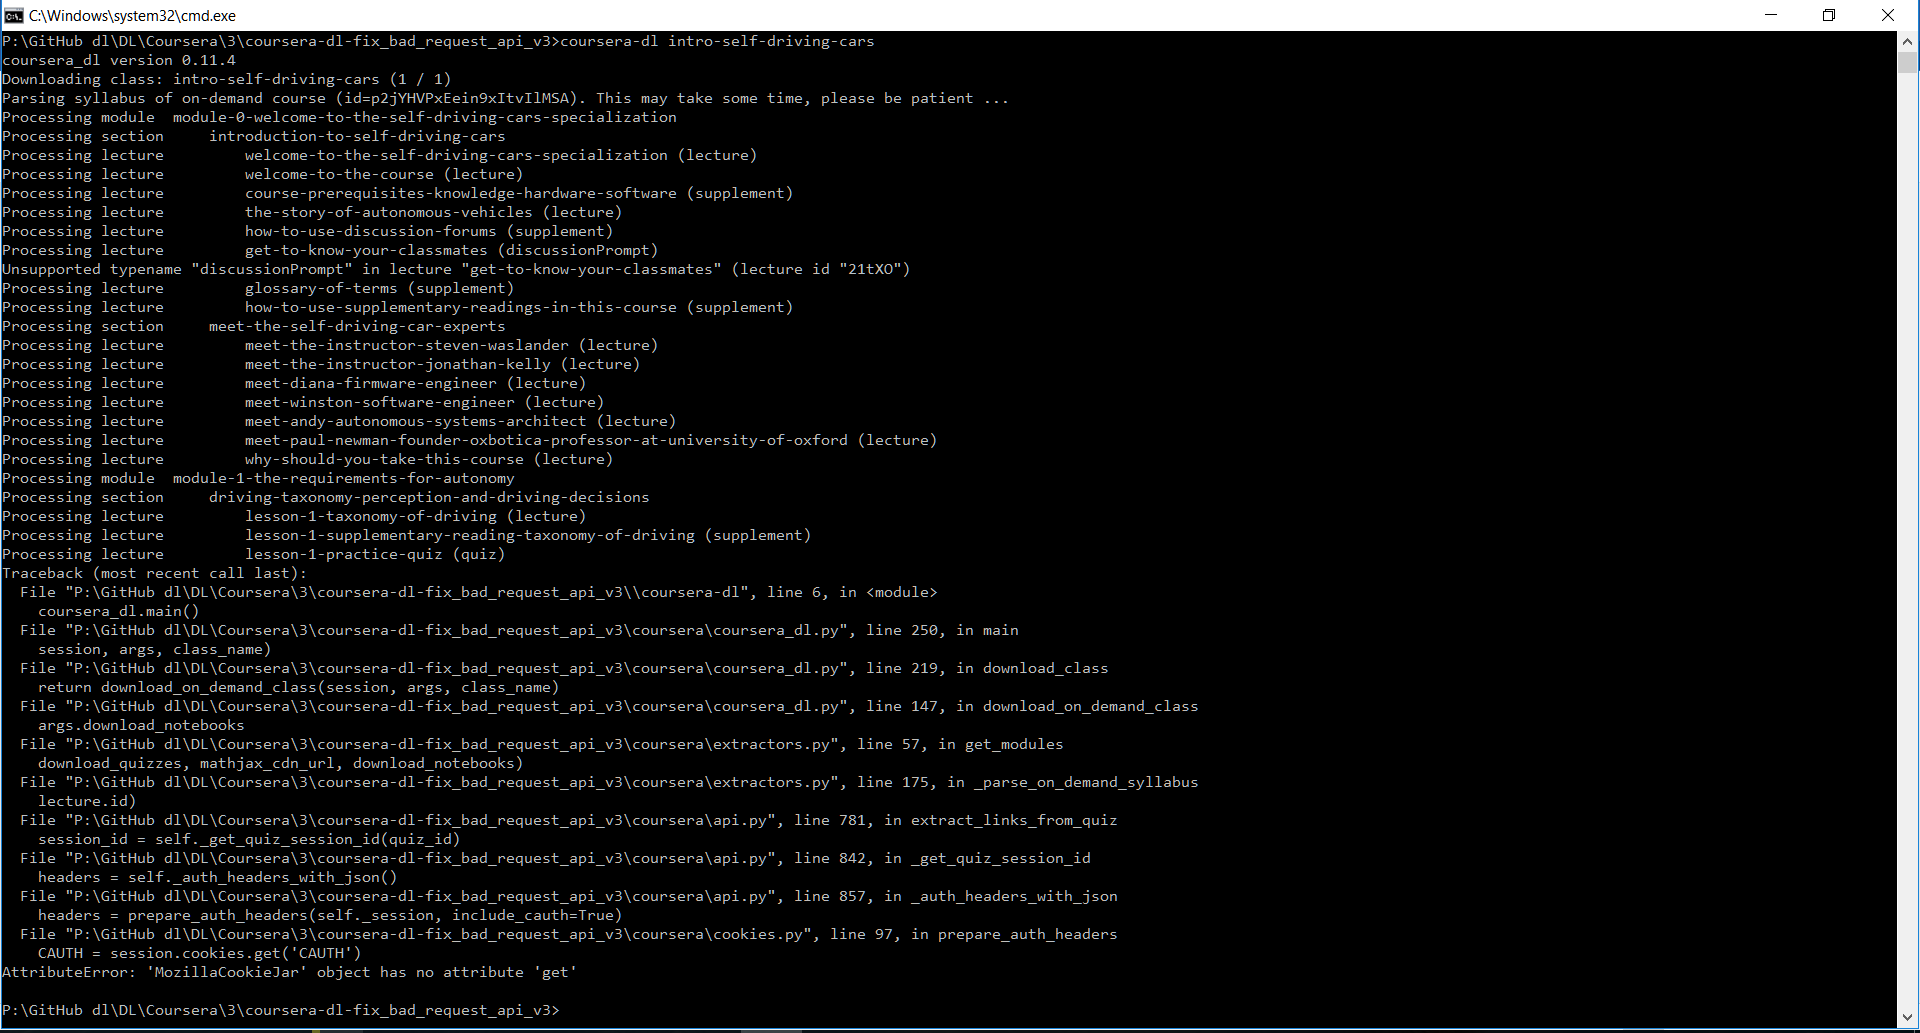 Developers - HTTPError: 400 Client Error: Bad Request for url: https